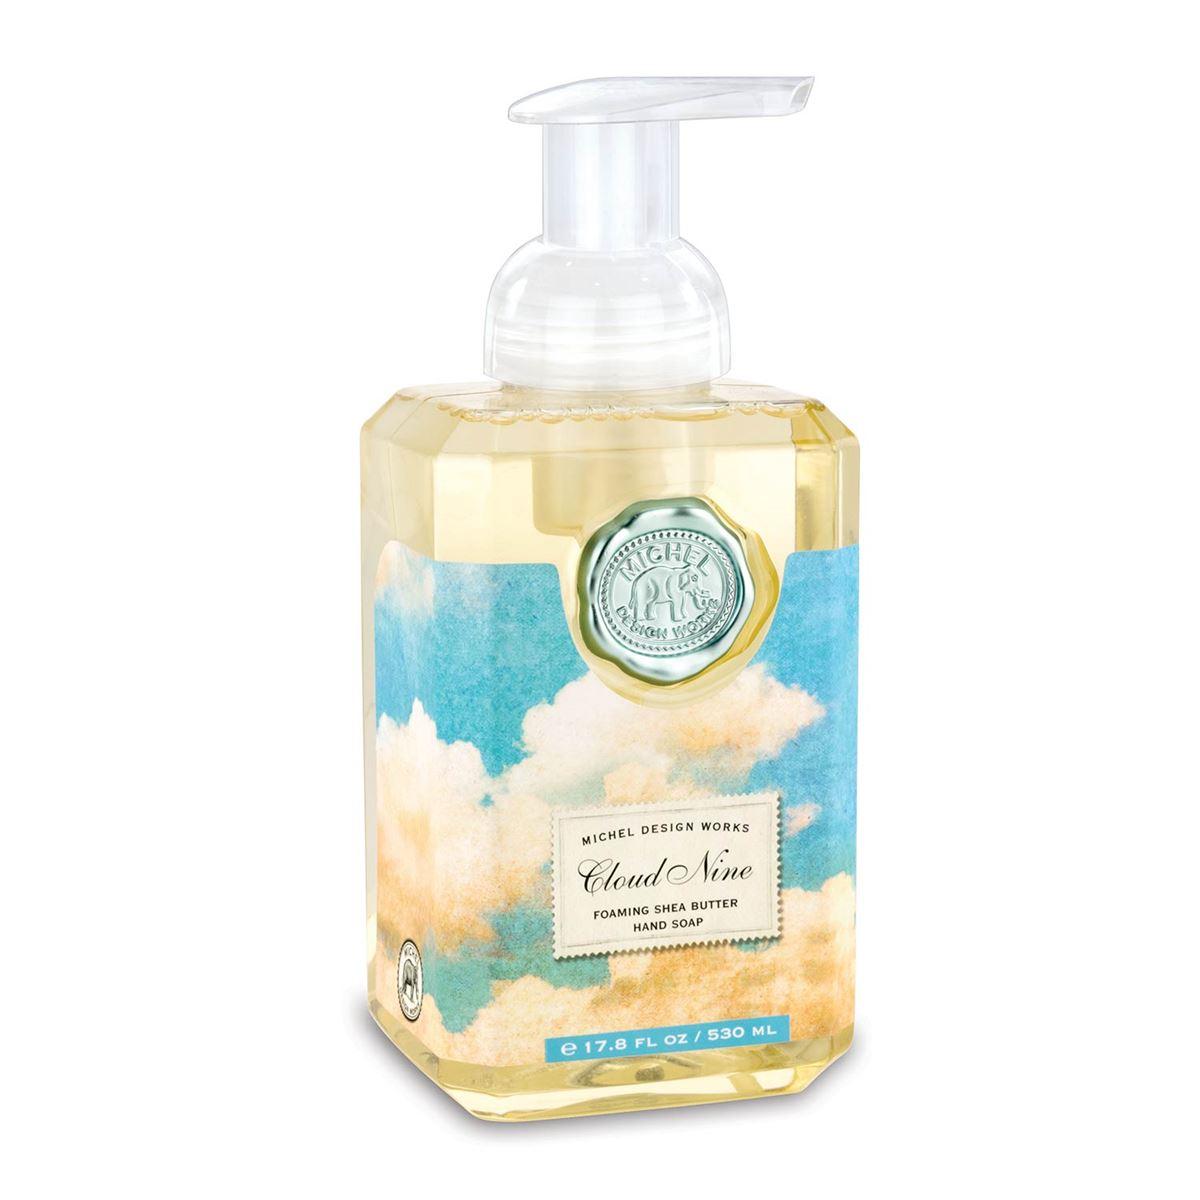 Cloud Nine Foaming Hand Soap